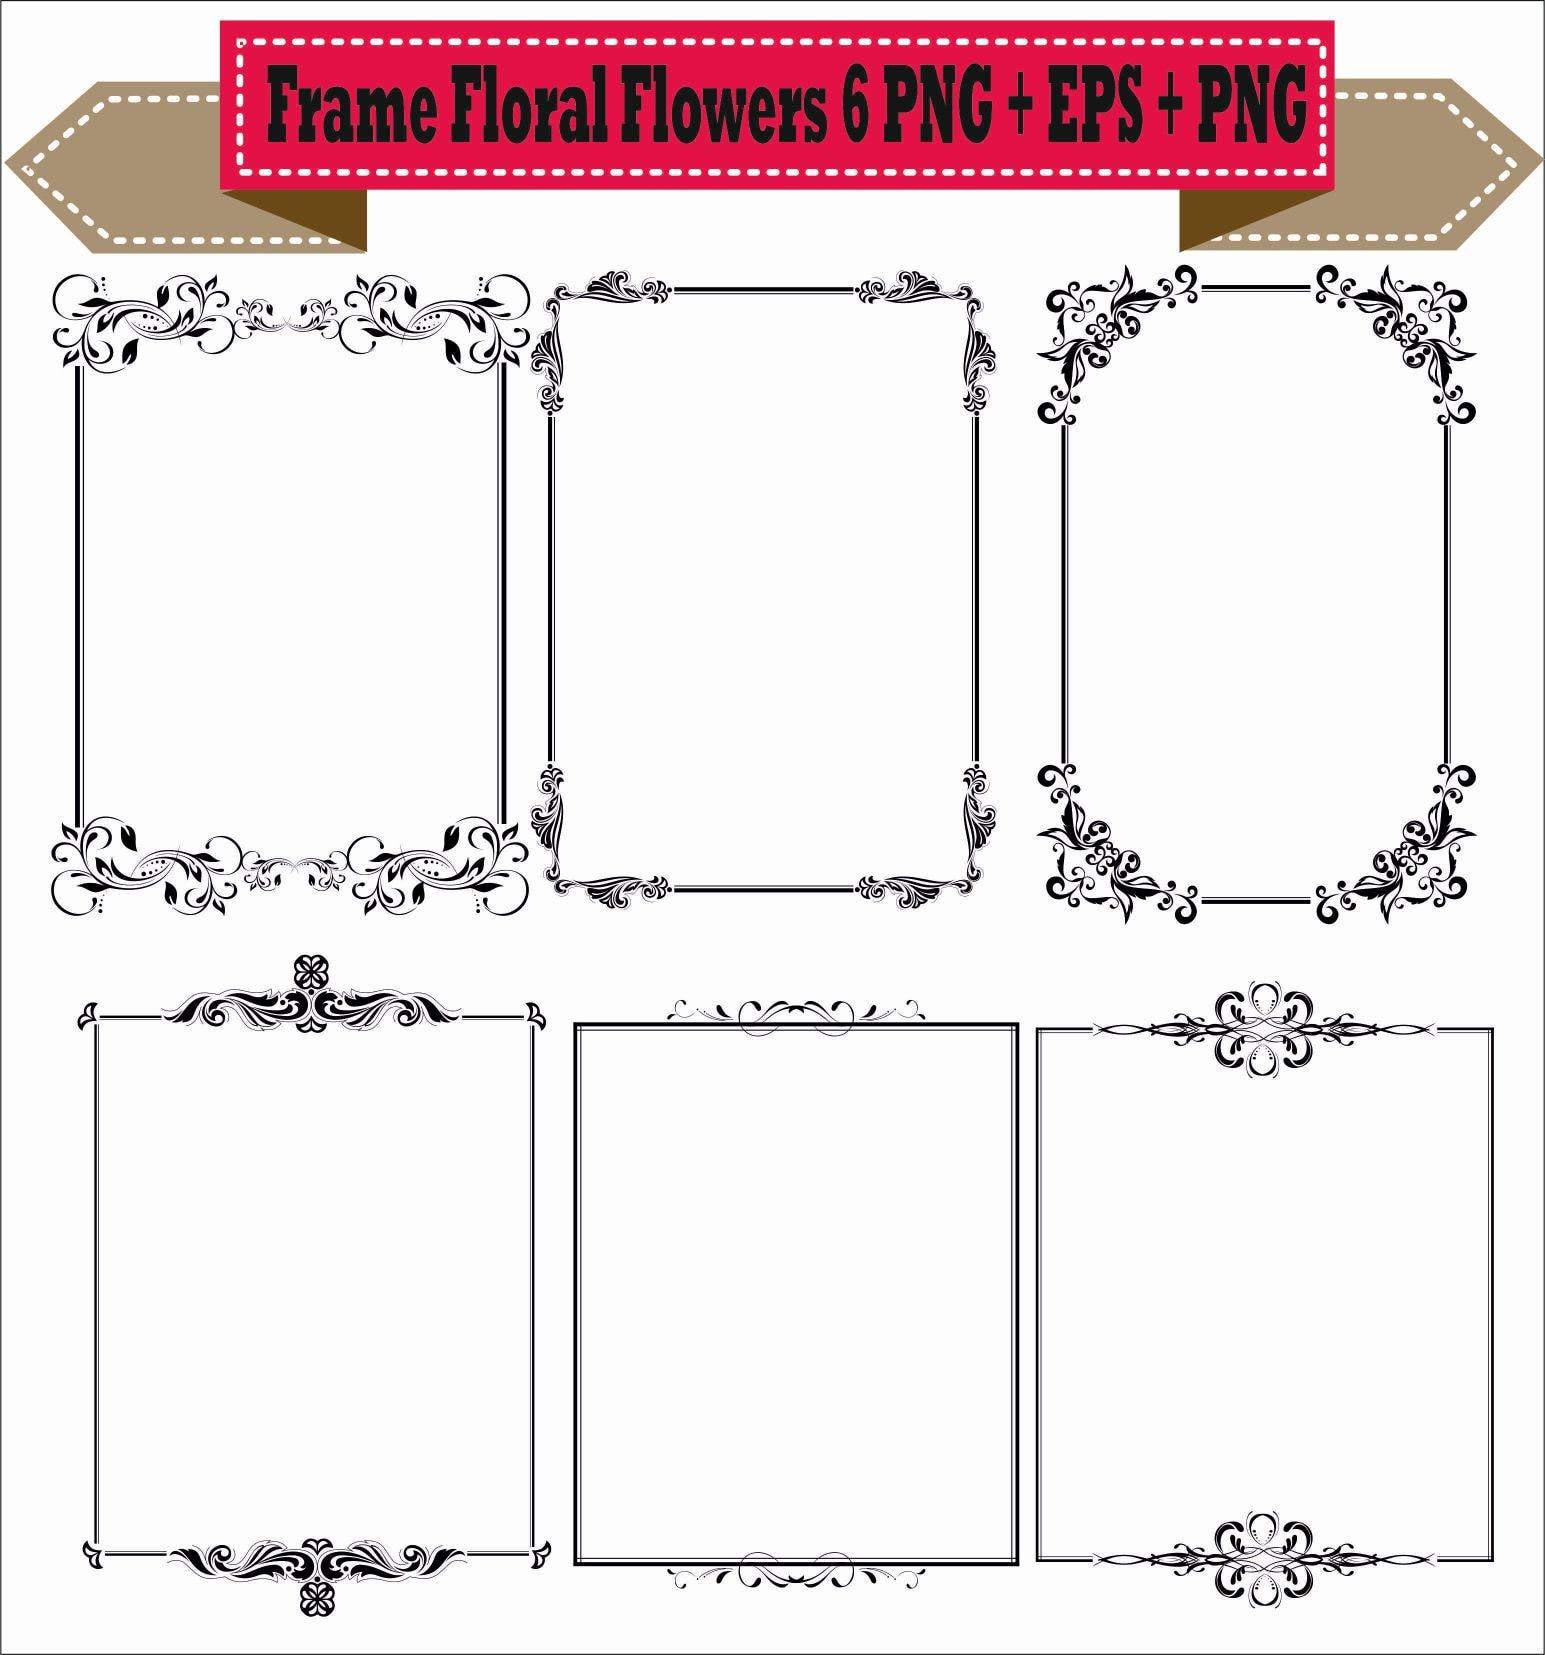 Rahmen Rahmen Blumen Blumen Vektor Vintage Retro Clipart PNG | Etsy